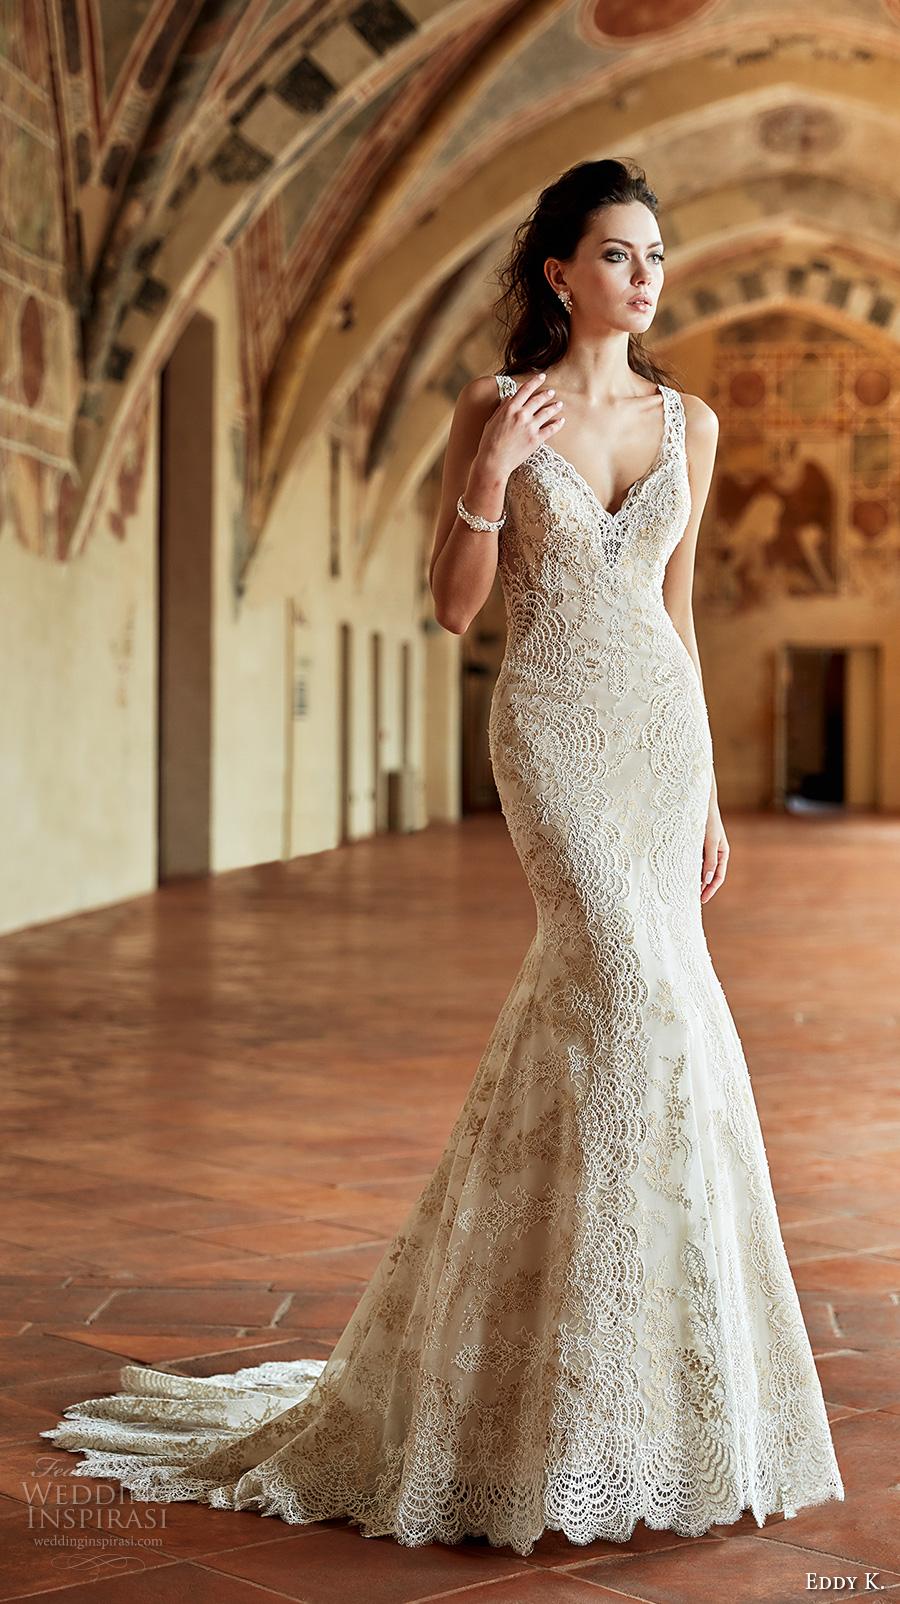 Wedding Dresses In Portland Oregon 99 Inspirational eddy k couture bridal